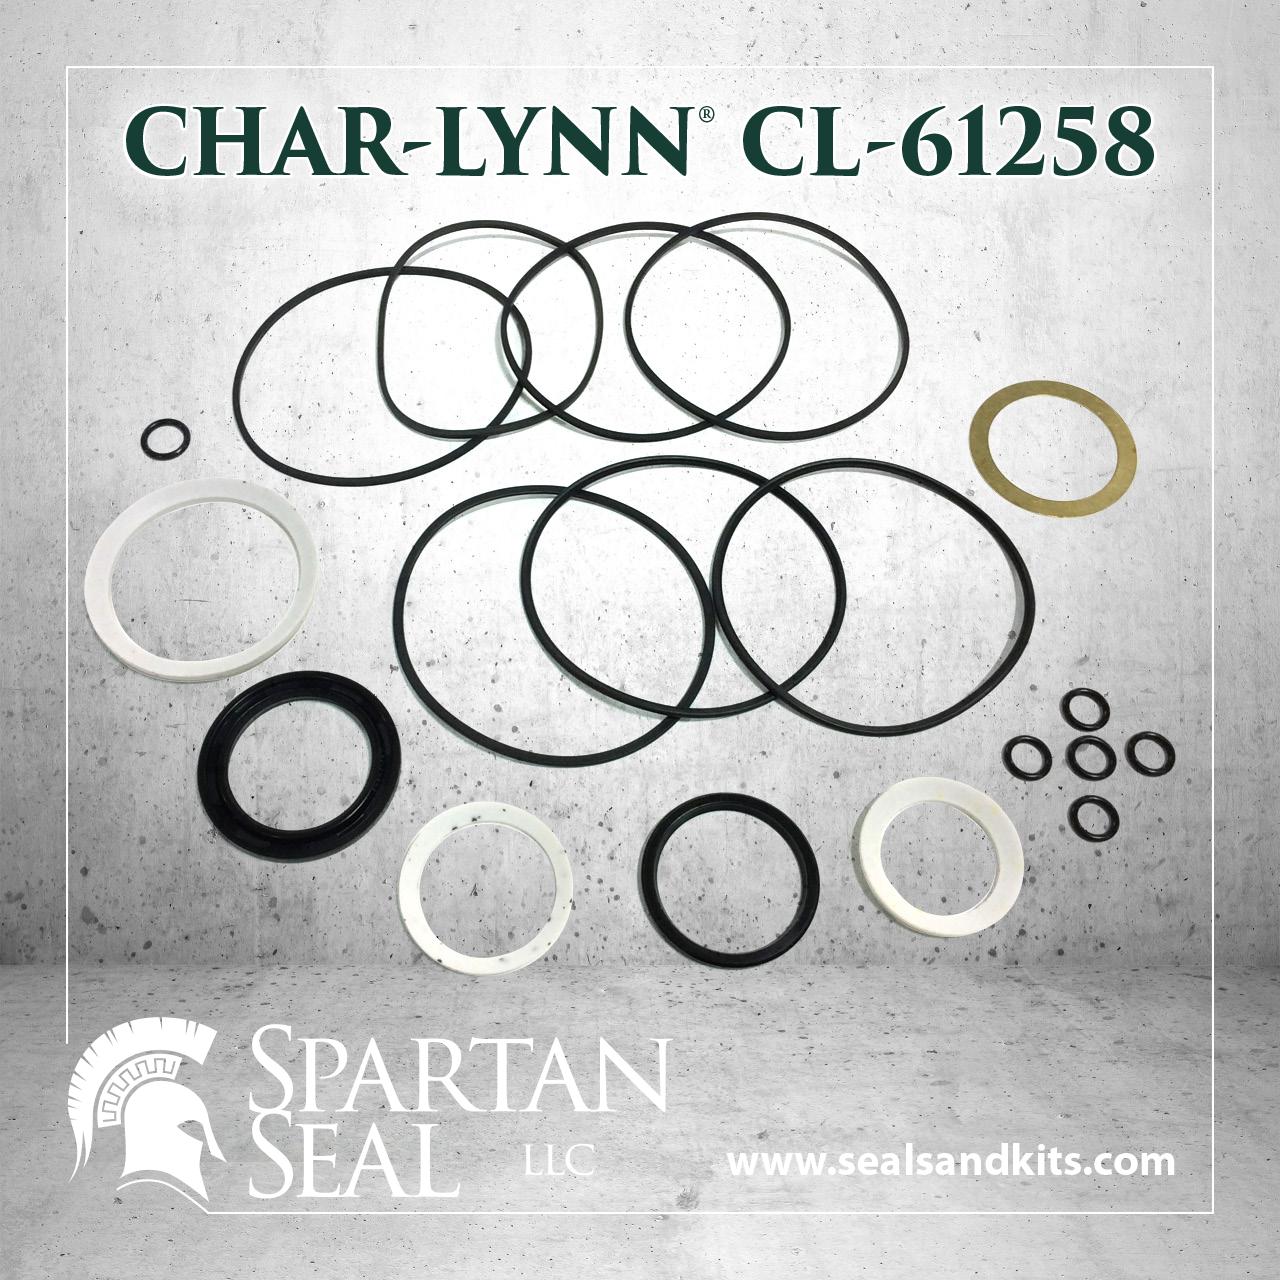 Char-Lynn 61258 Seal Kit New Replacement